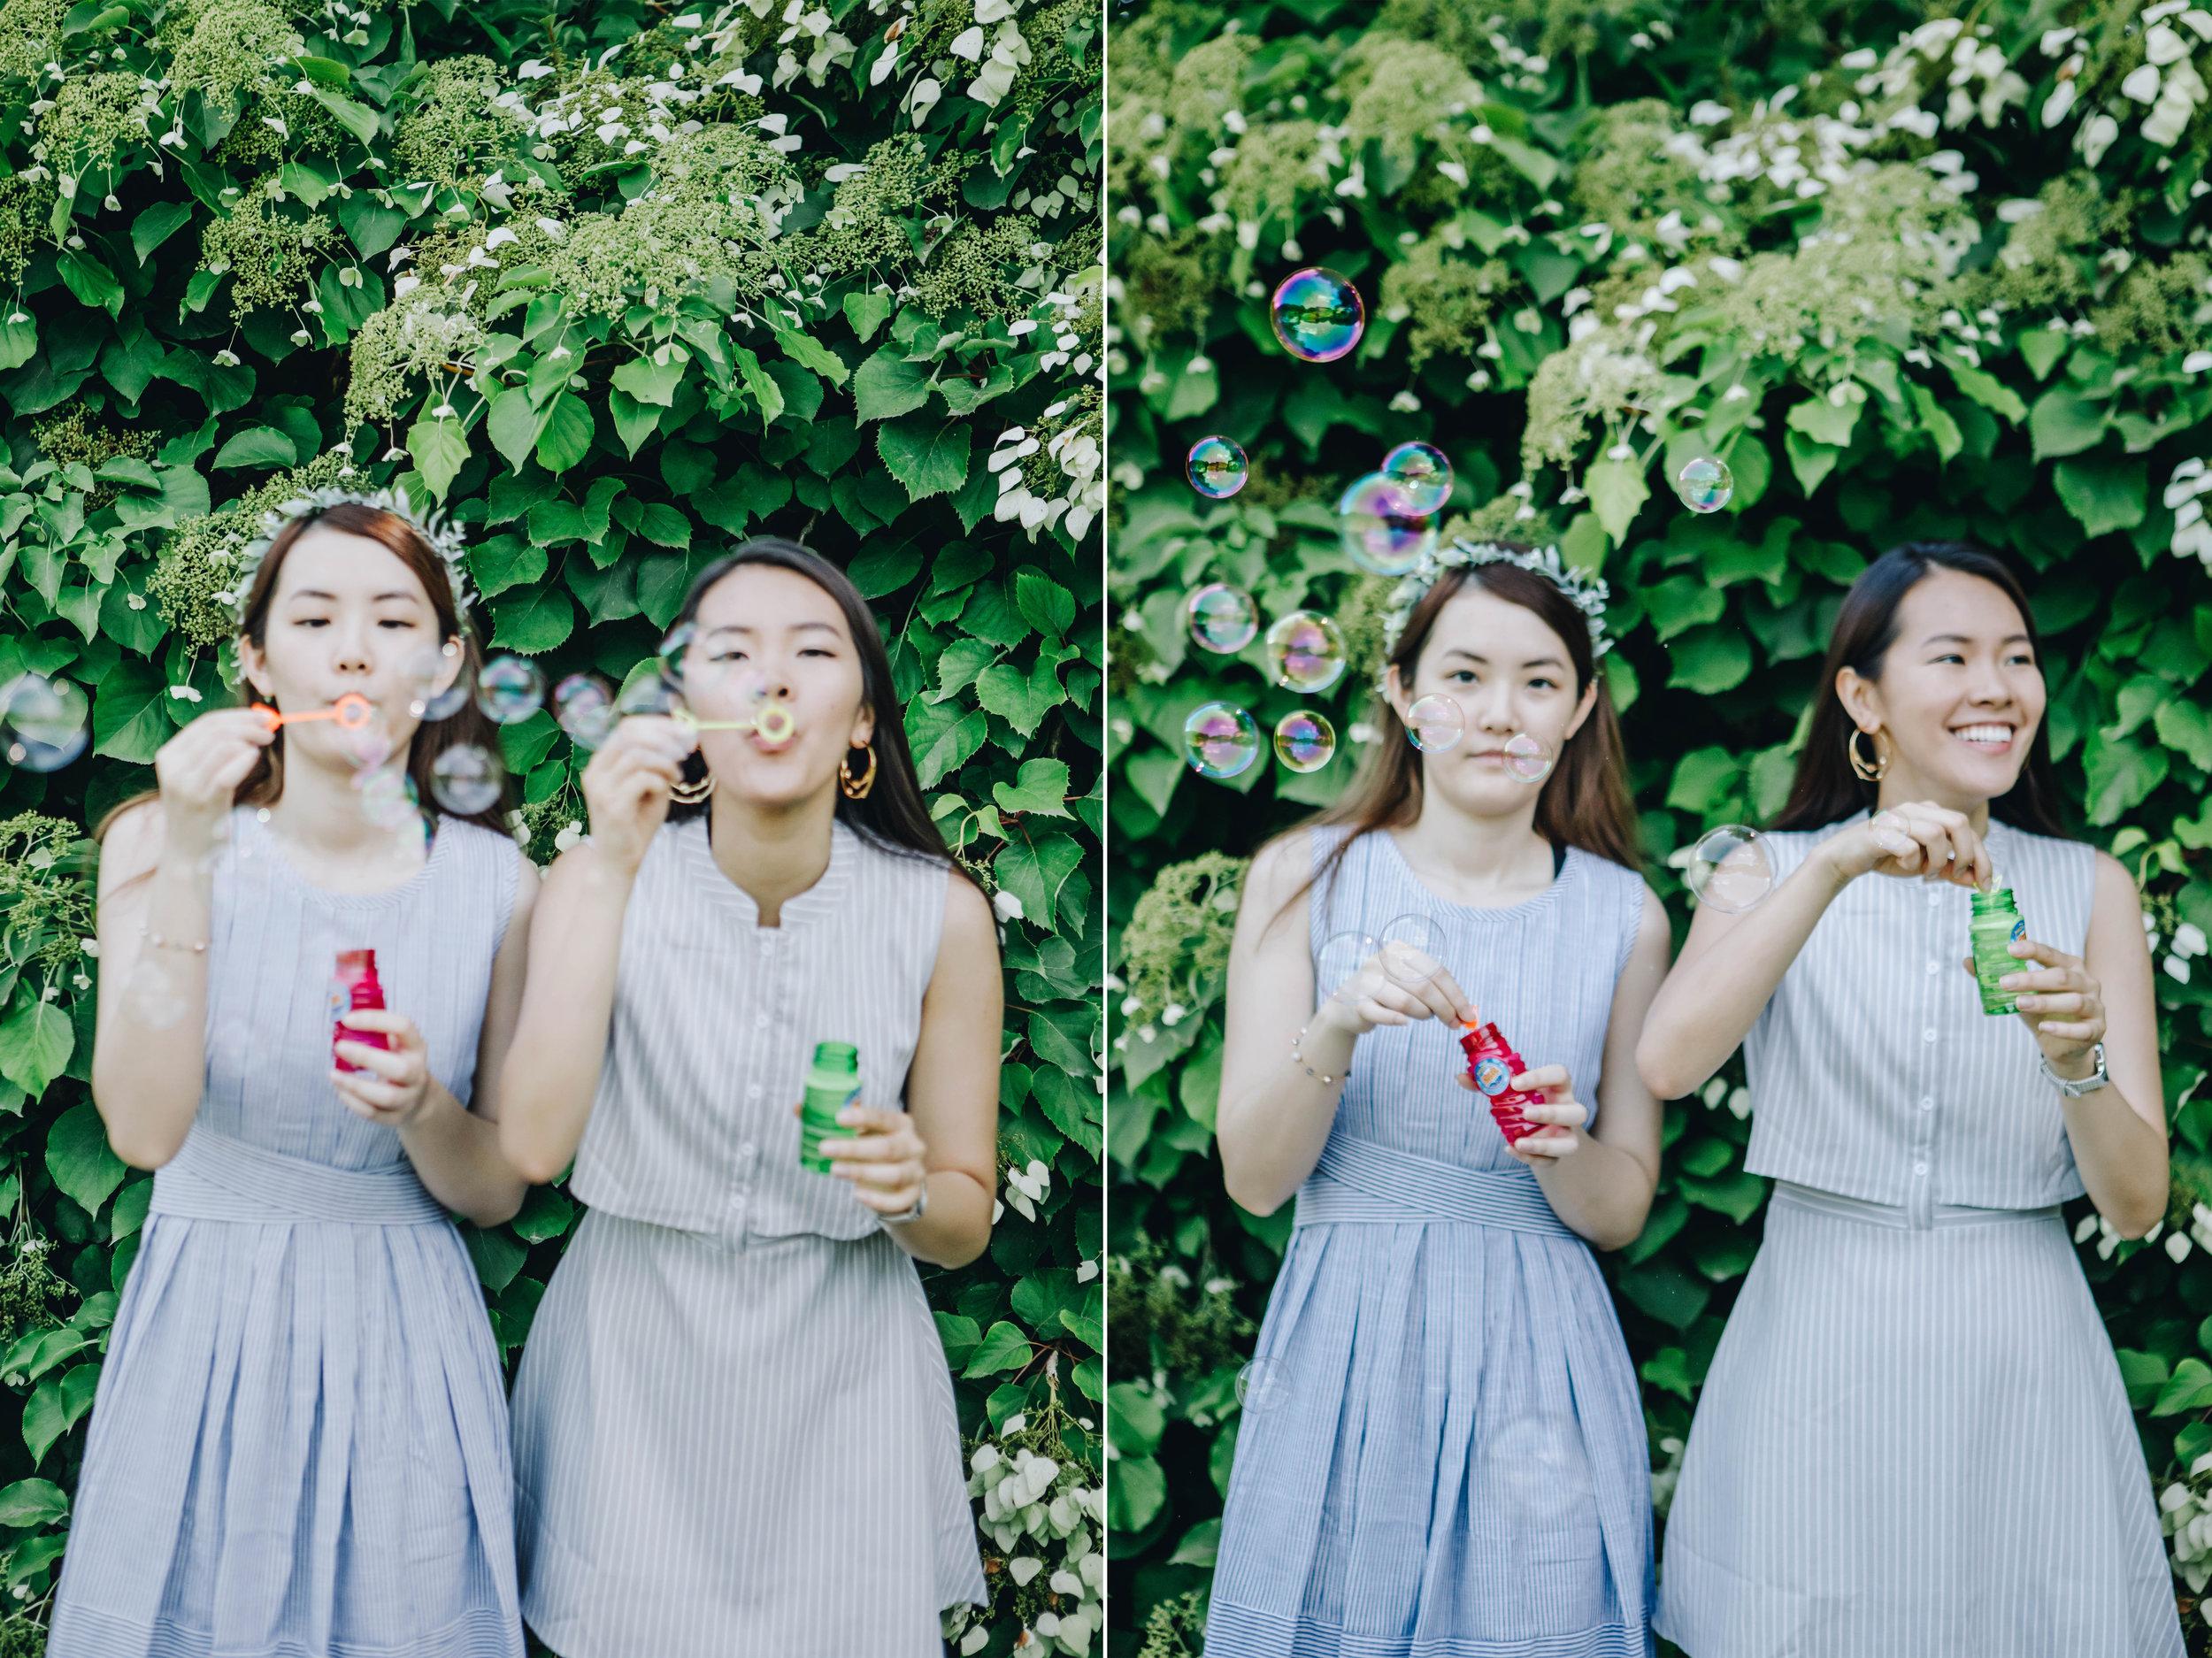 sisters-in-summertime-eva-loh-06.jpg